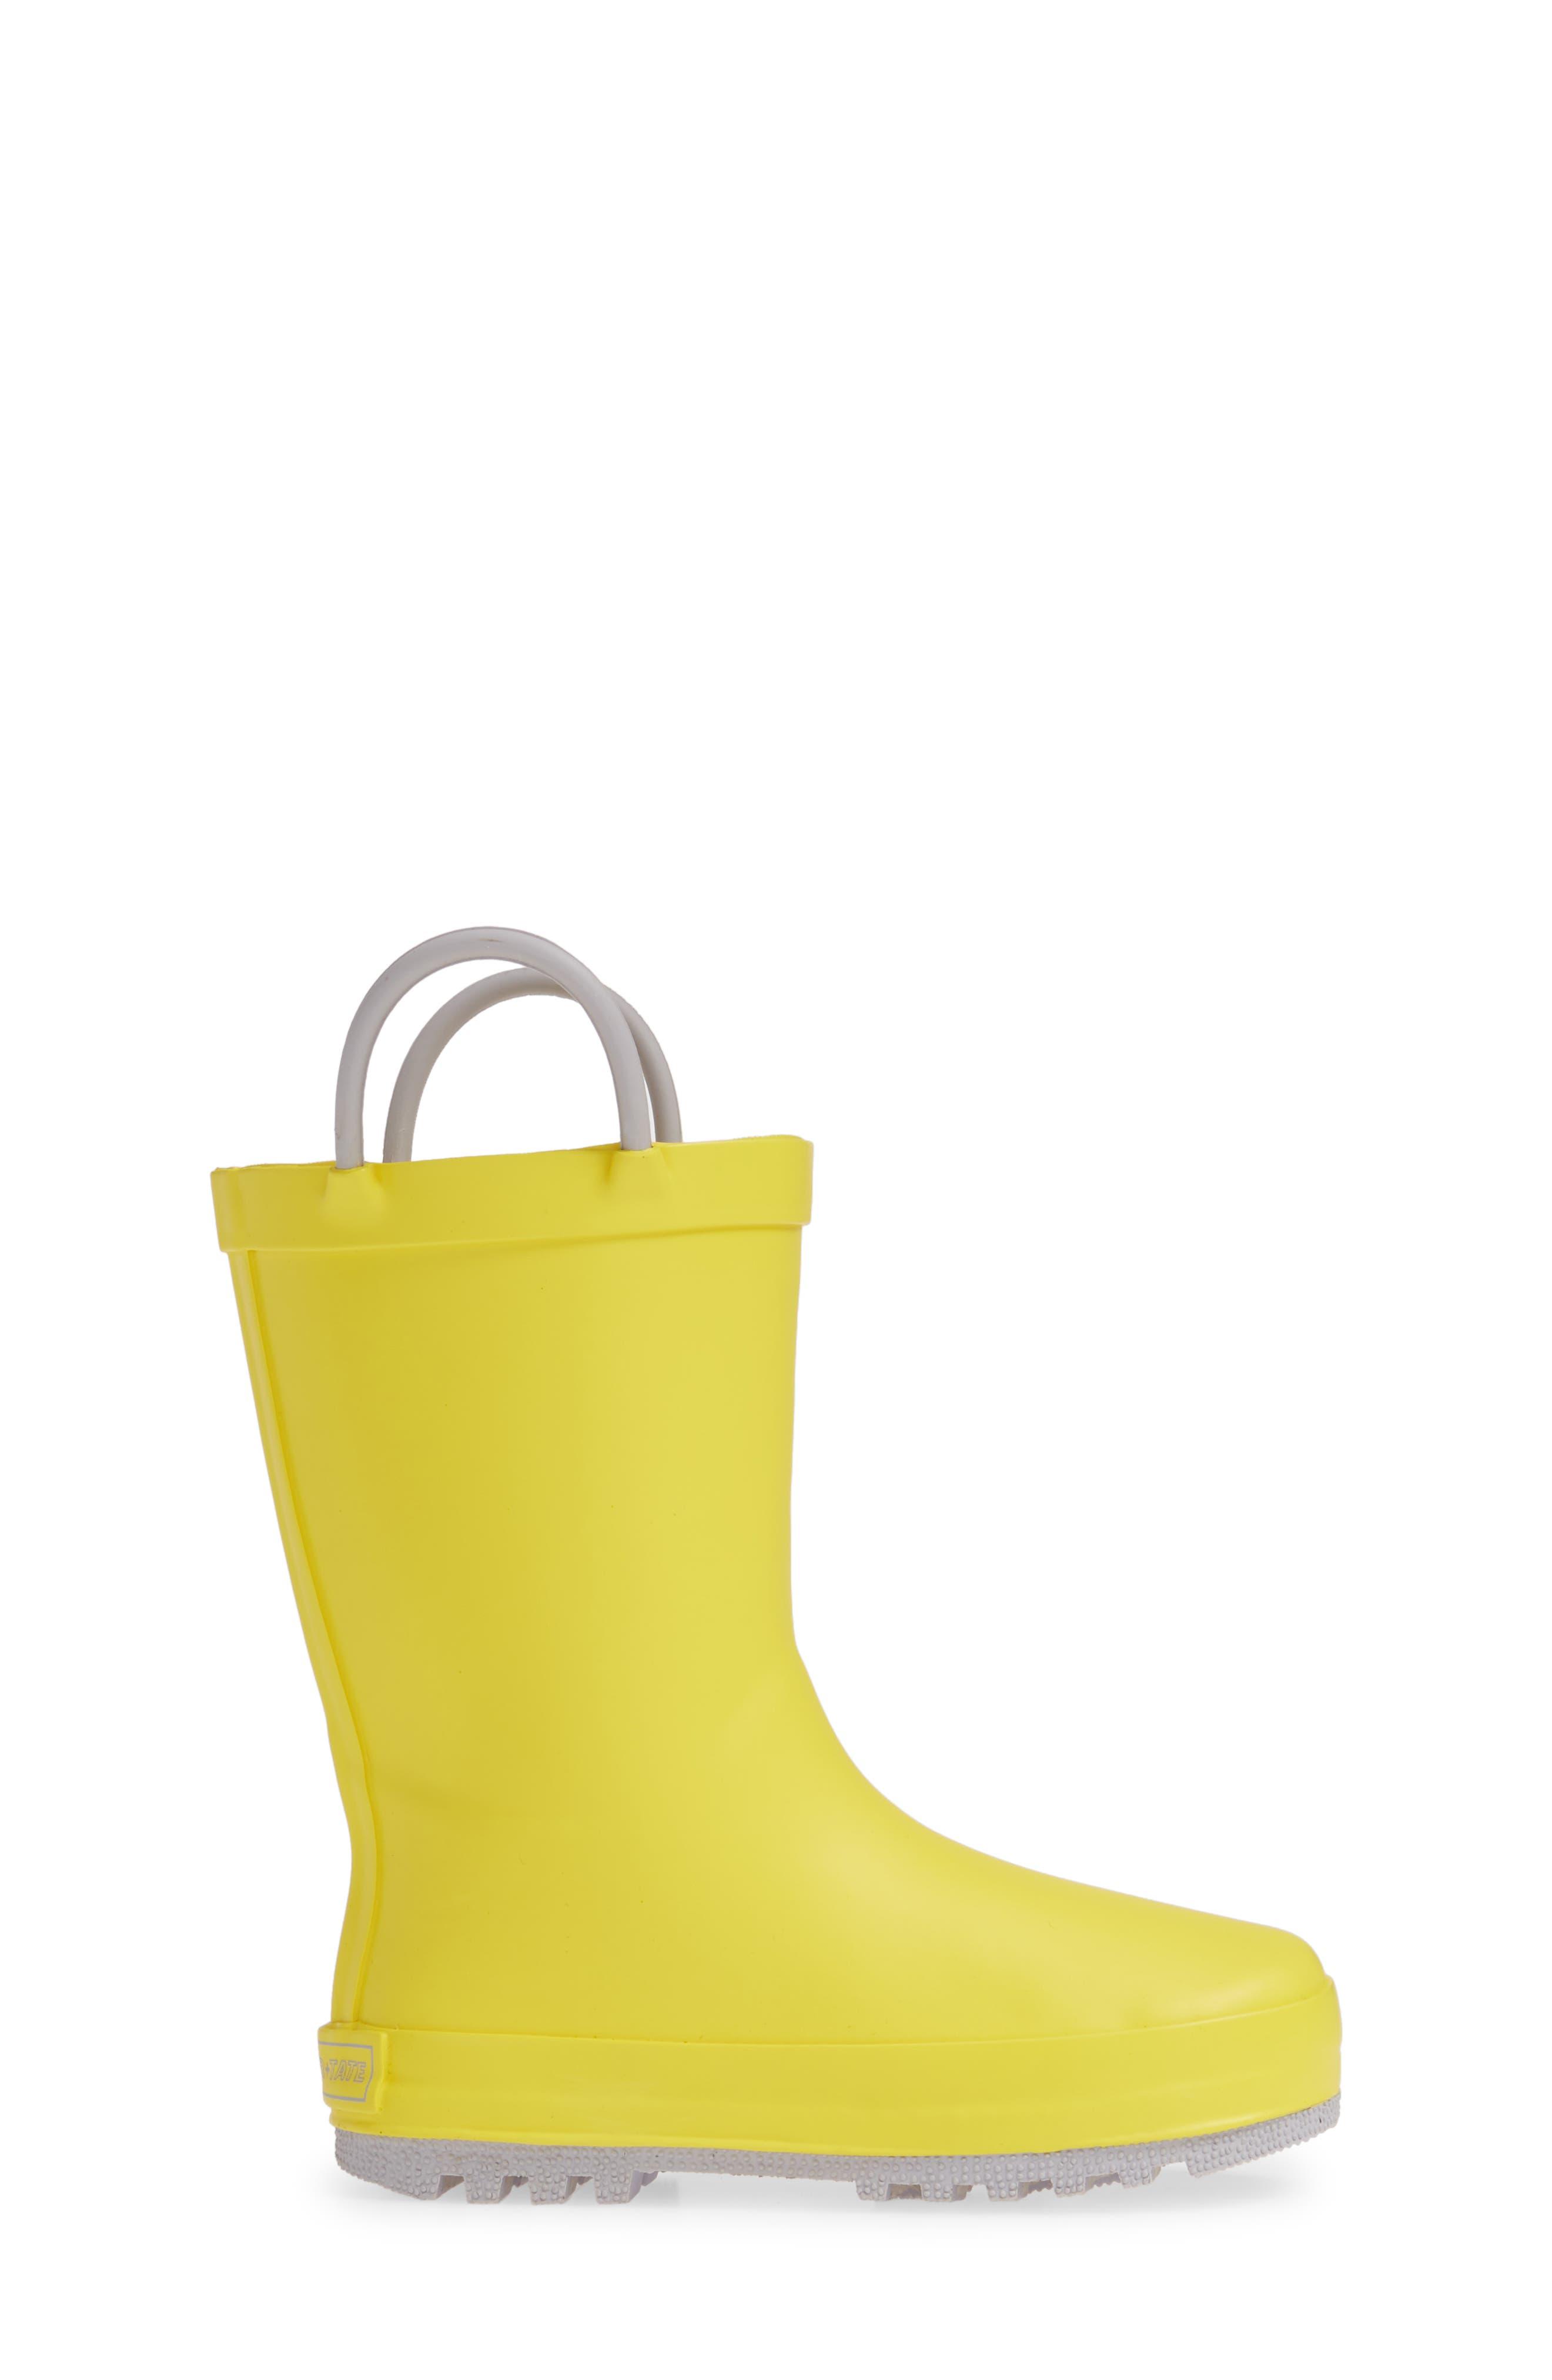 TUCKER + TATE,                             Puddle Rain Boot,                             Alternate thumbnail 3, color,                             YELLOW/ GREY RUBBER